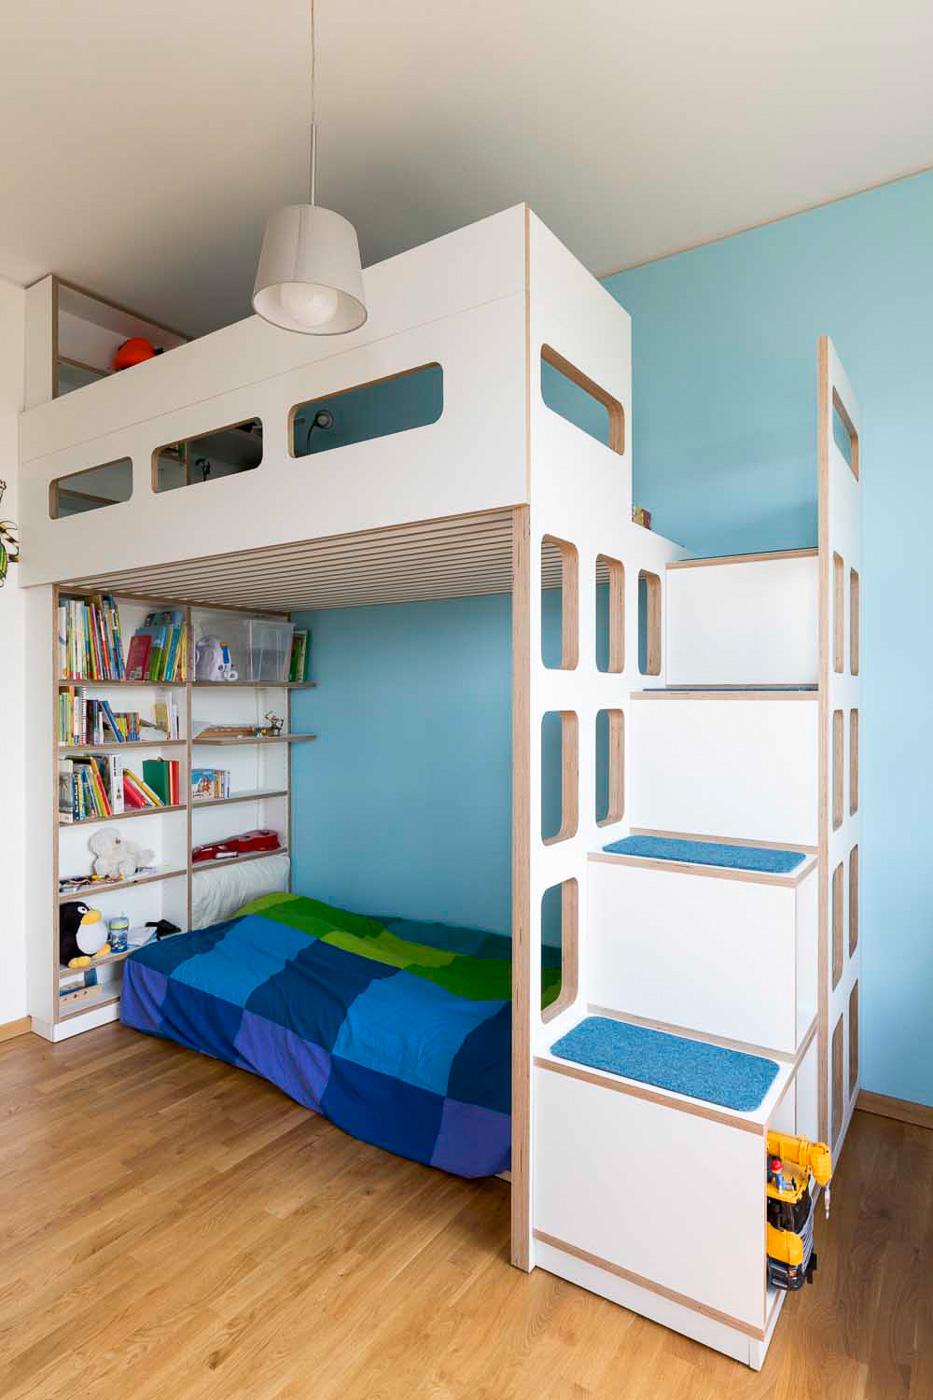 hochbett jan martin n rnberg. Black Bedroom Furniture Sets. Home Design Ideas